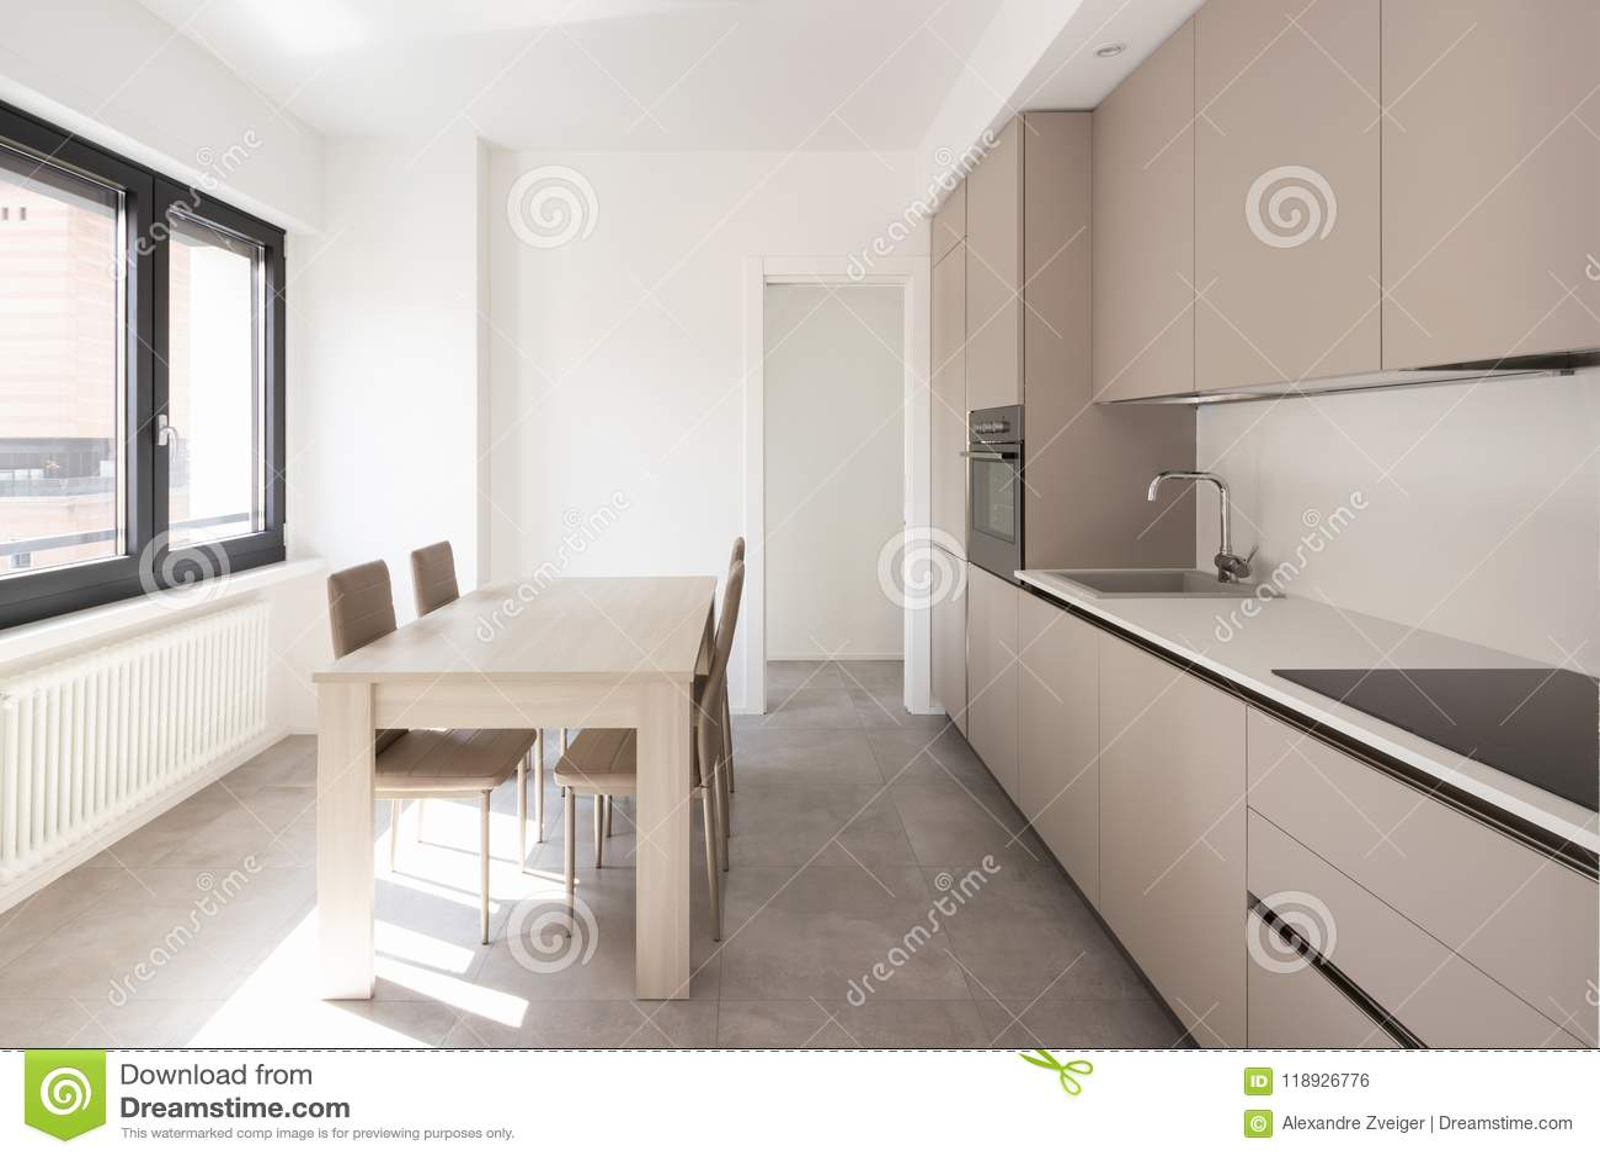 Cocina mínima en un apartamento moderno